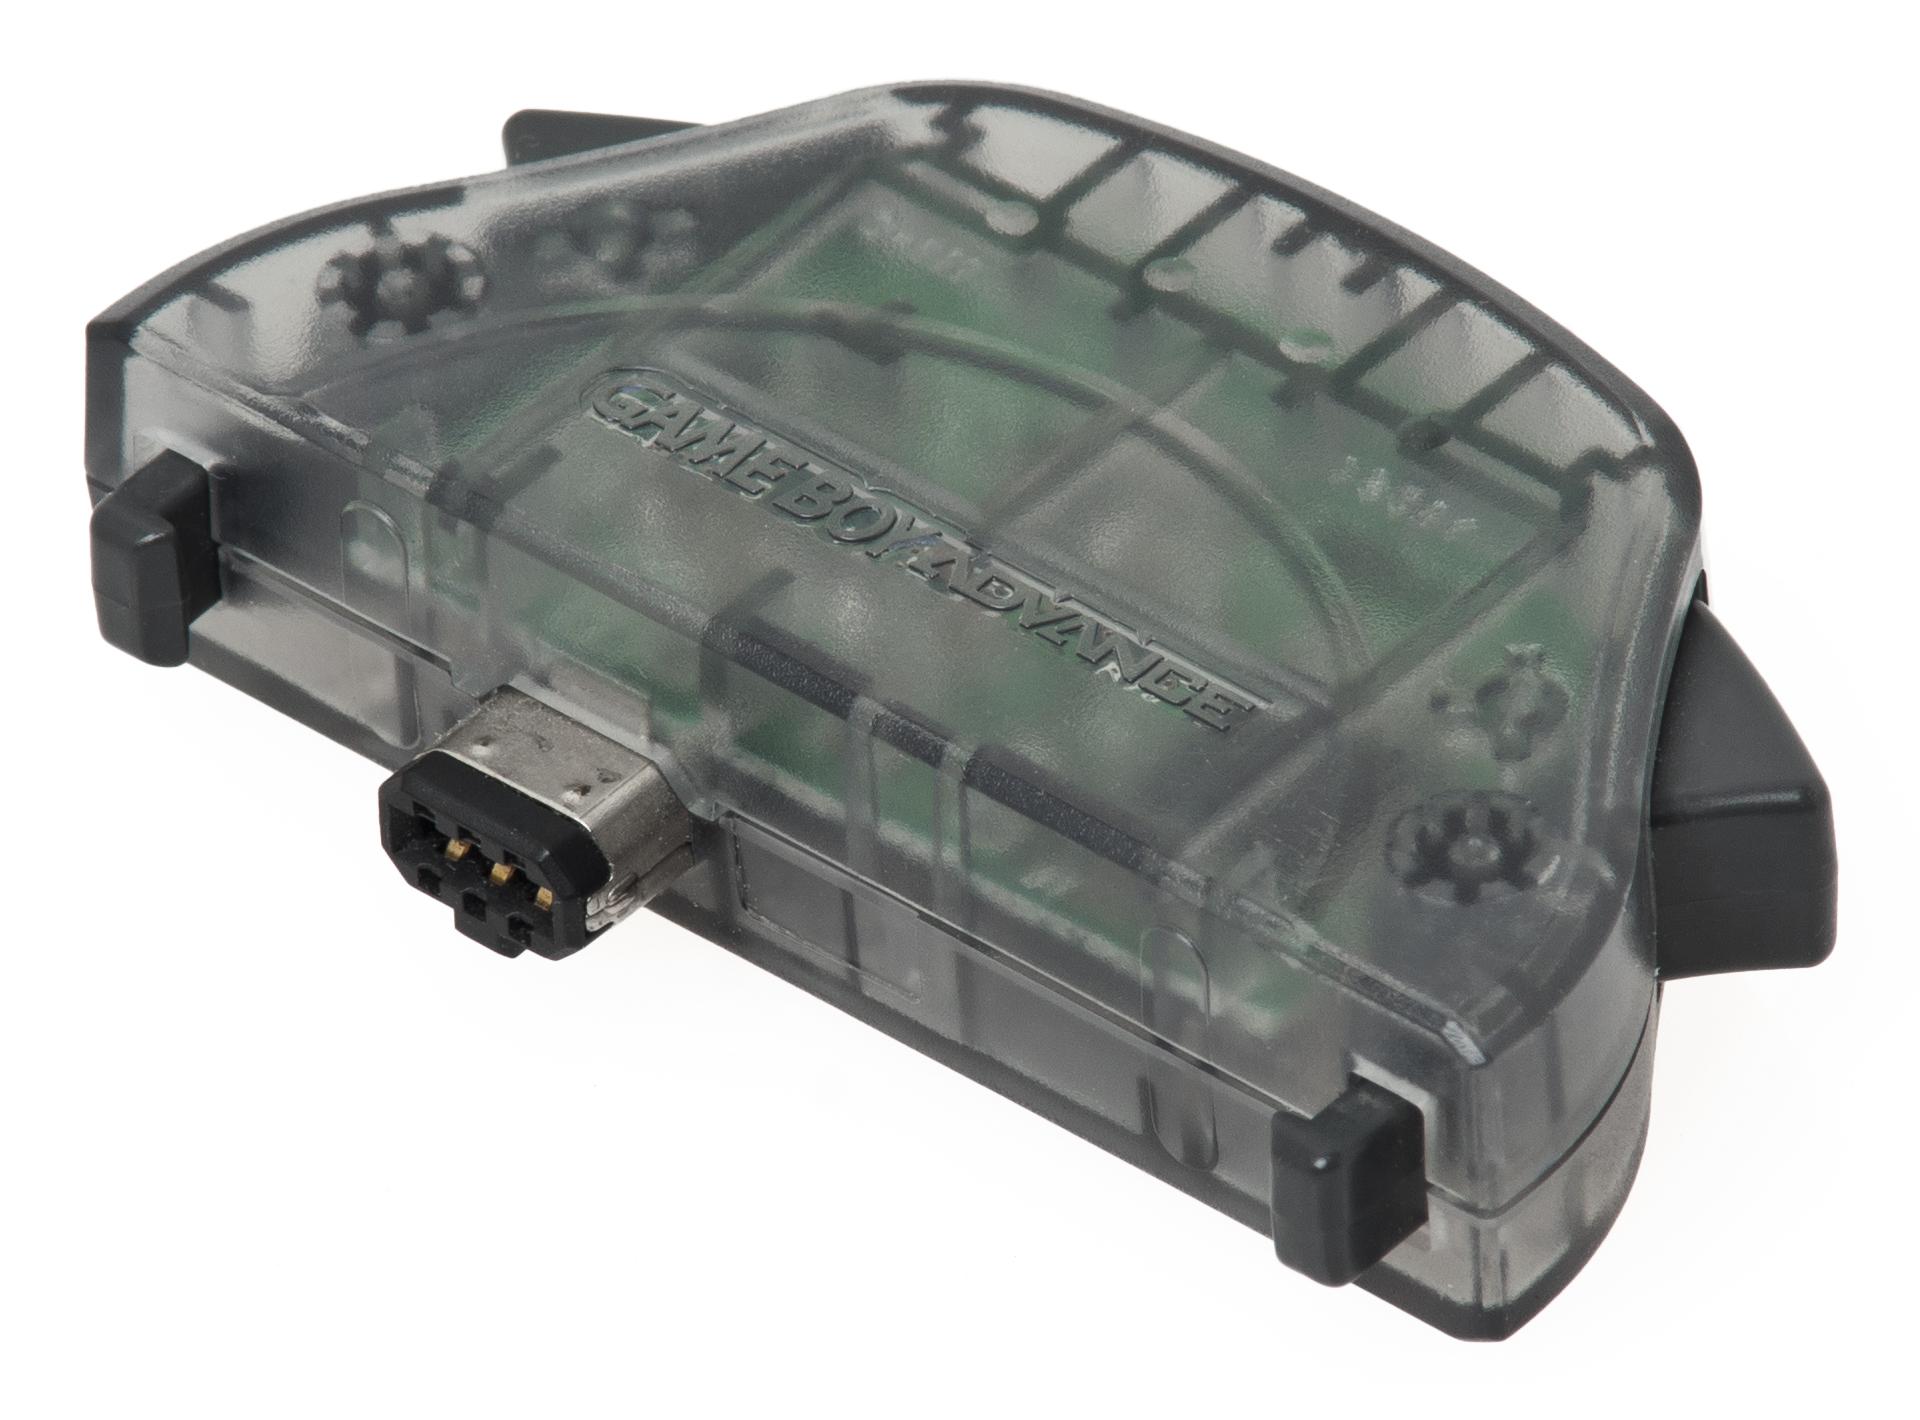 5510100346 Gameboy Advance GBA Wireless Adapter Link GB